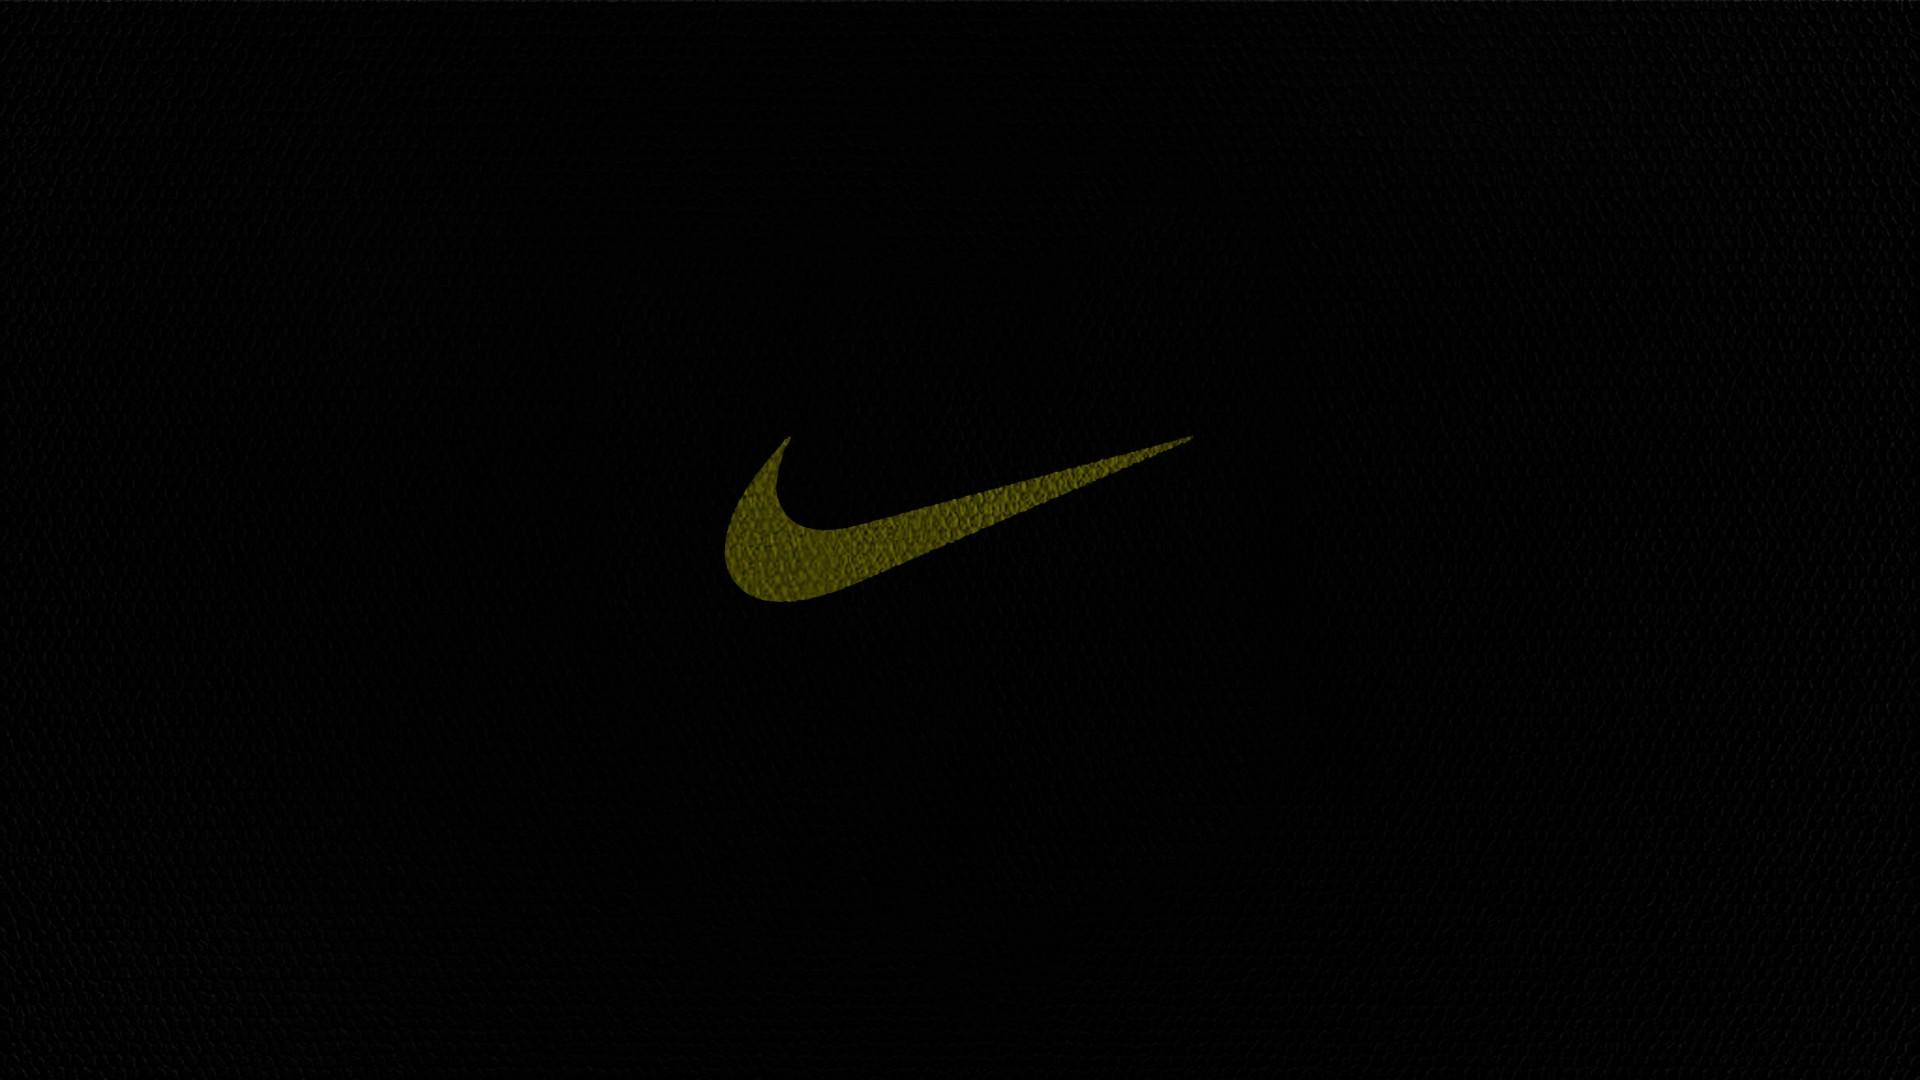 75+ Hd Nike Wallpapers on WallpaperSafari